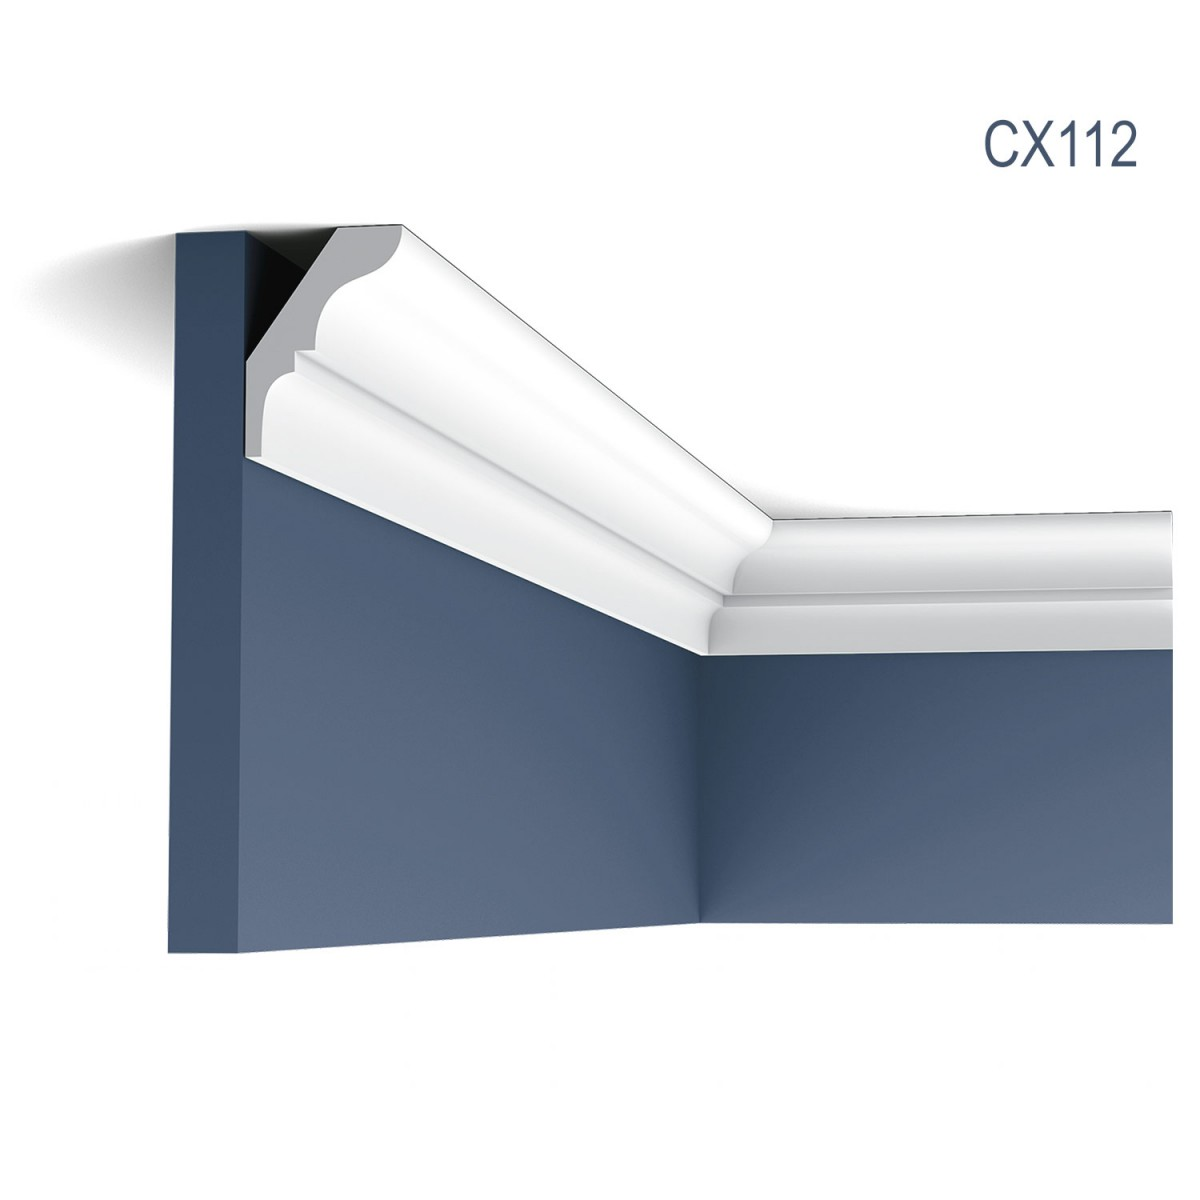 Cornisa Axxent CX112, Dimensiuni: 200 X 5.4 X 3.8 cm, Orac Decor